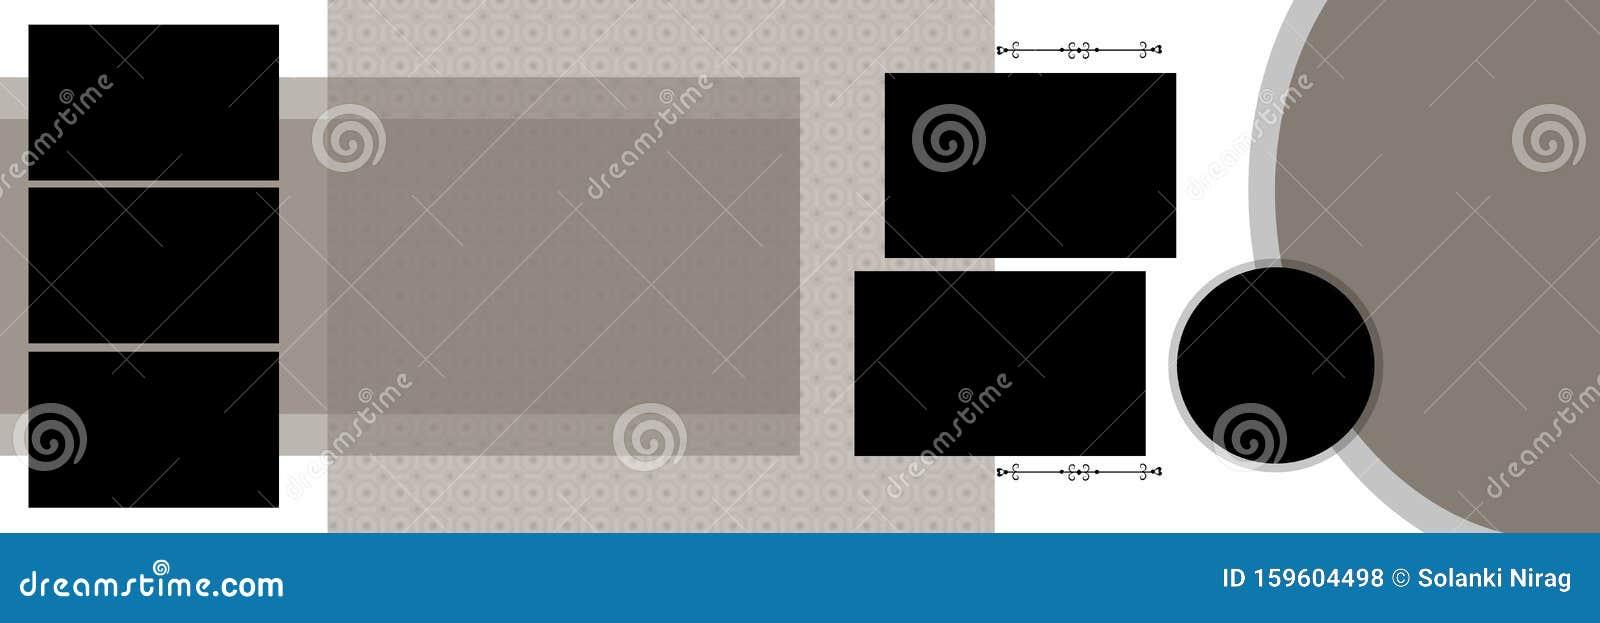 Wedding Album Design Background Photo Frames Stock